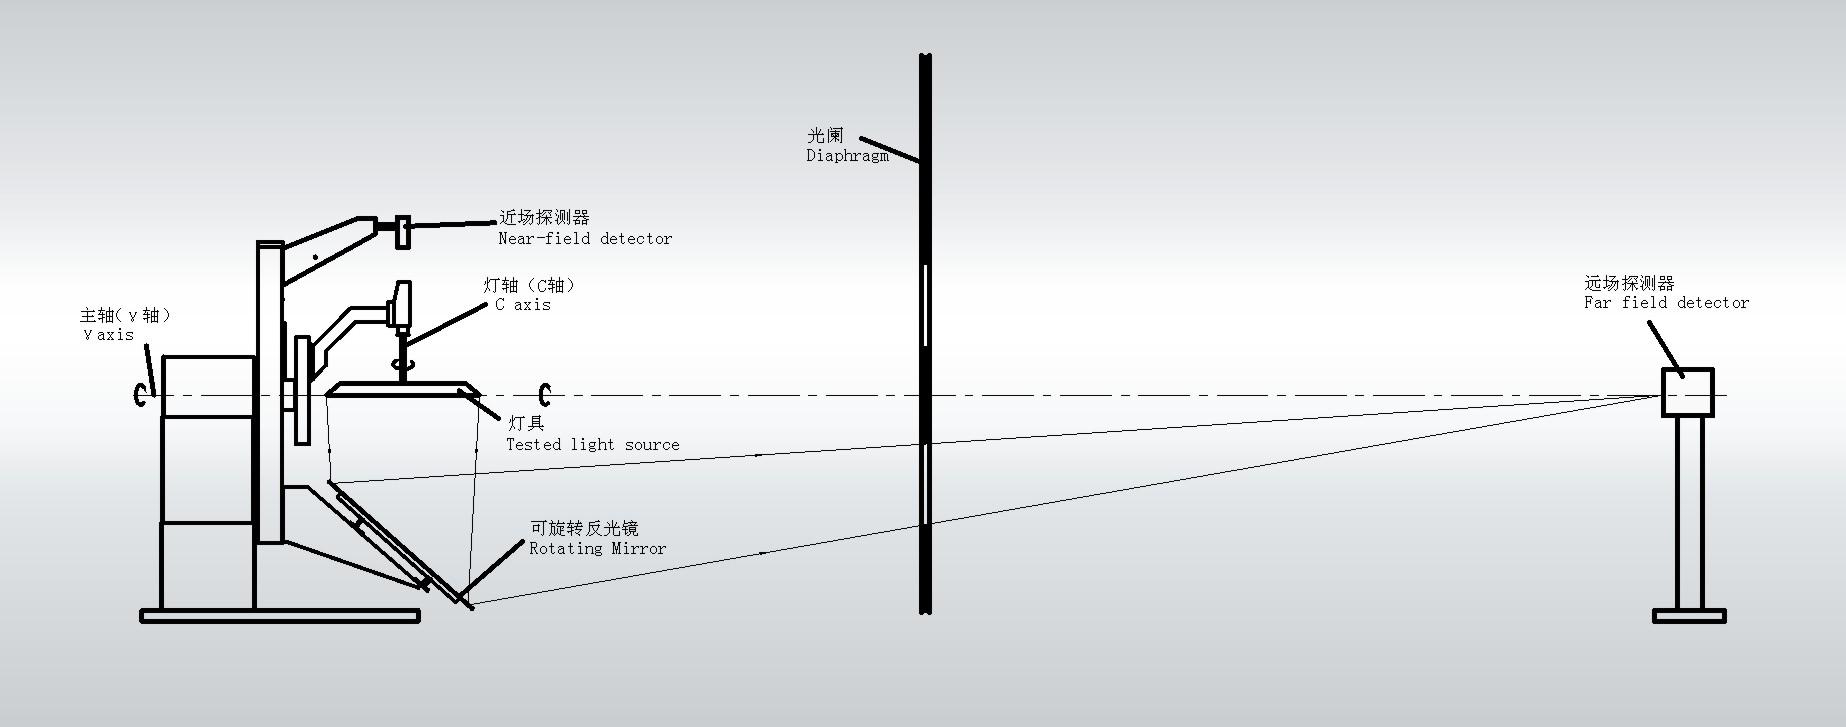 GPM-3000 分布光度计工作原理图.jpg